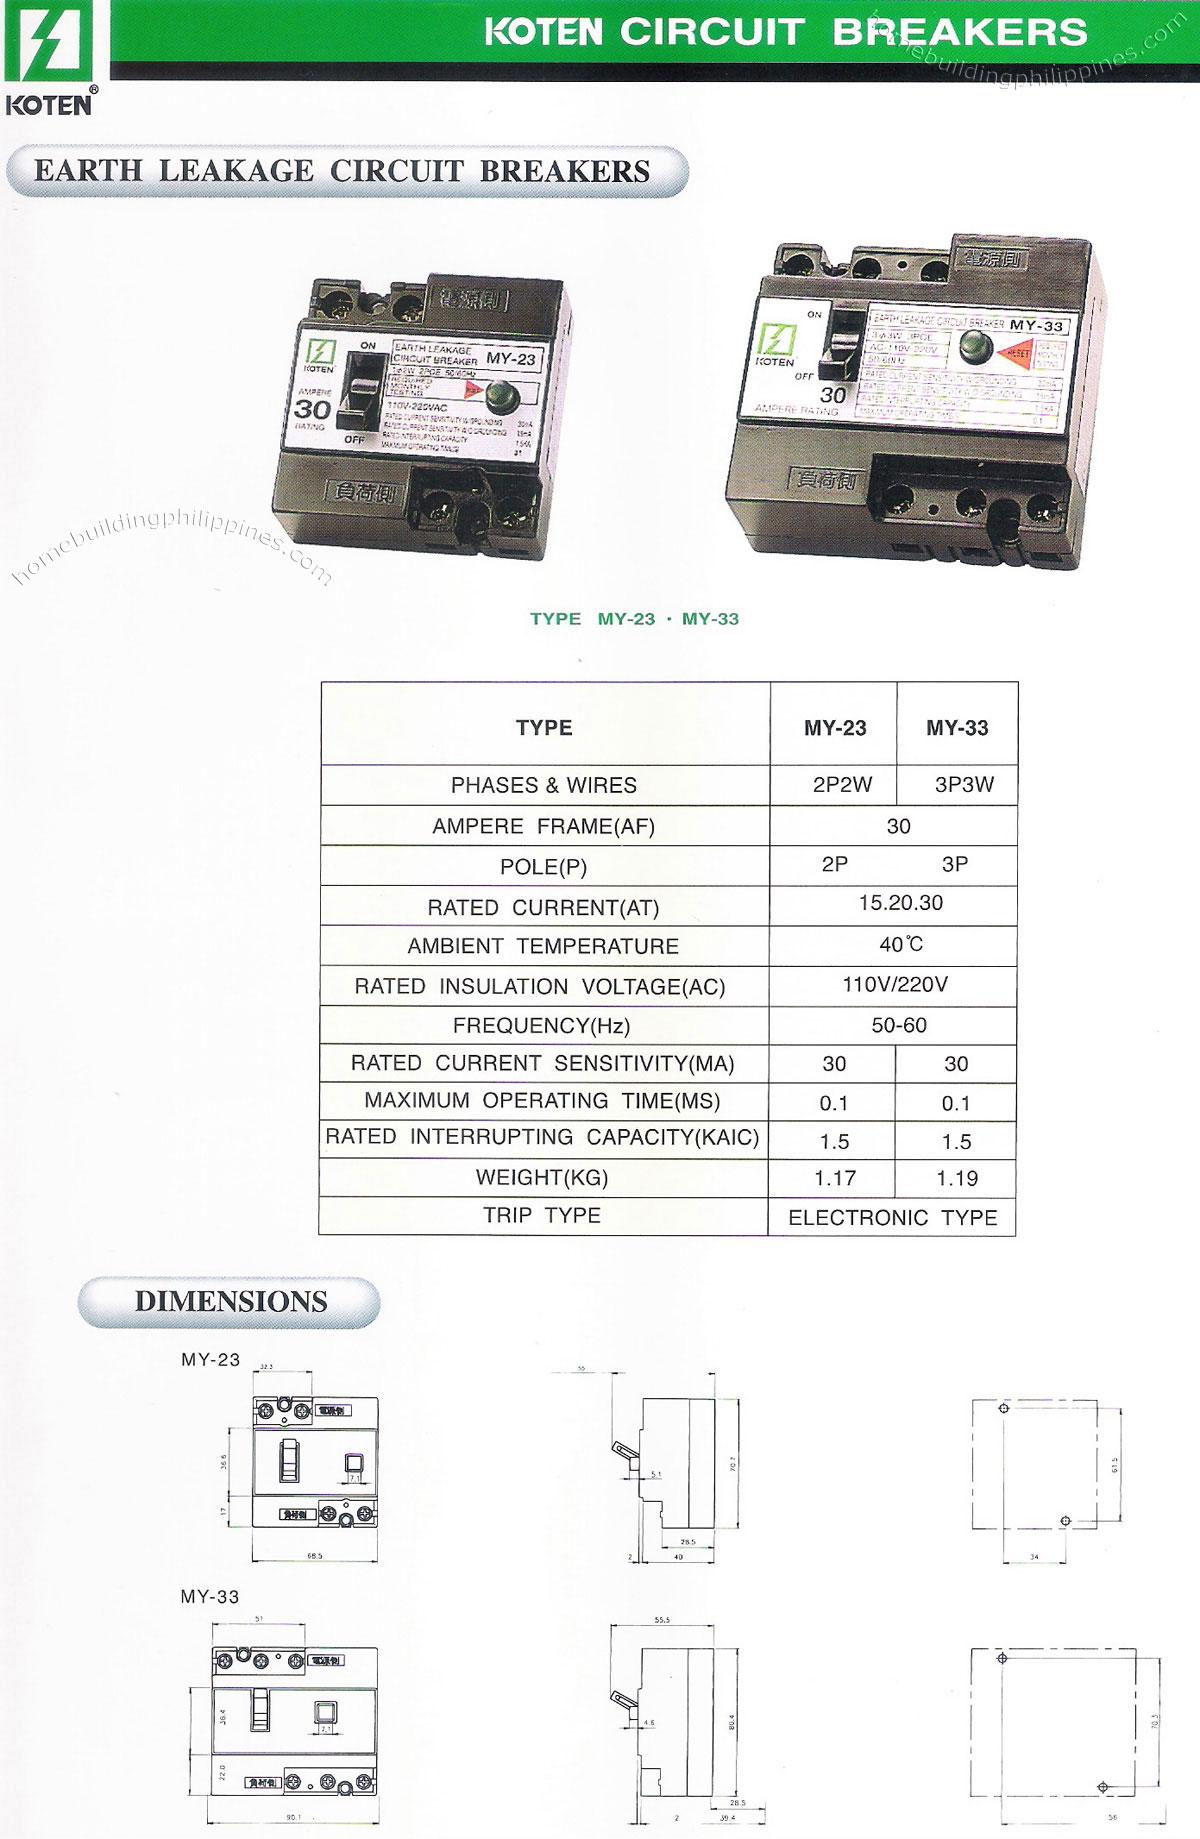 hight resolution of koten earth leakage circuit breakers koten earth leakage circuit breakers